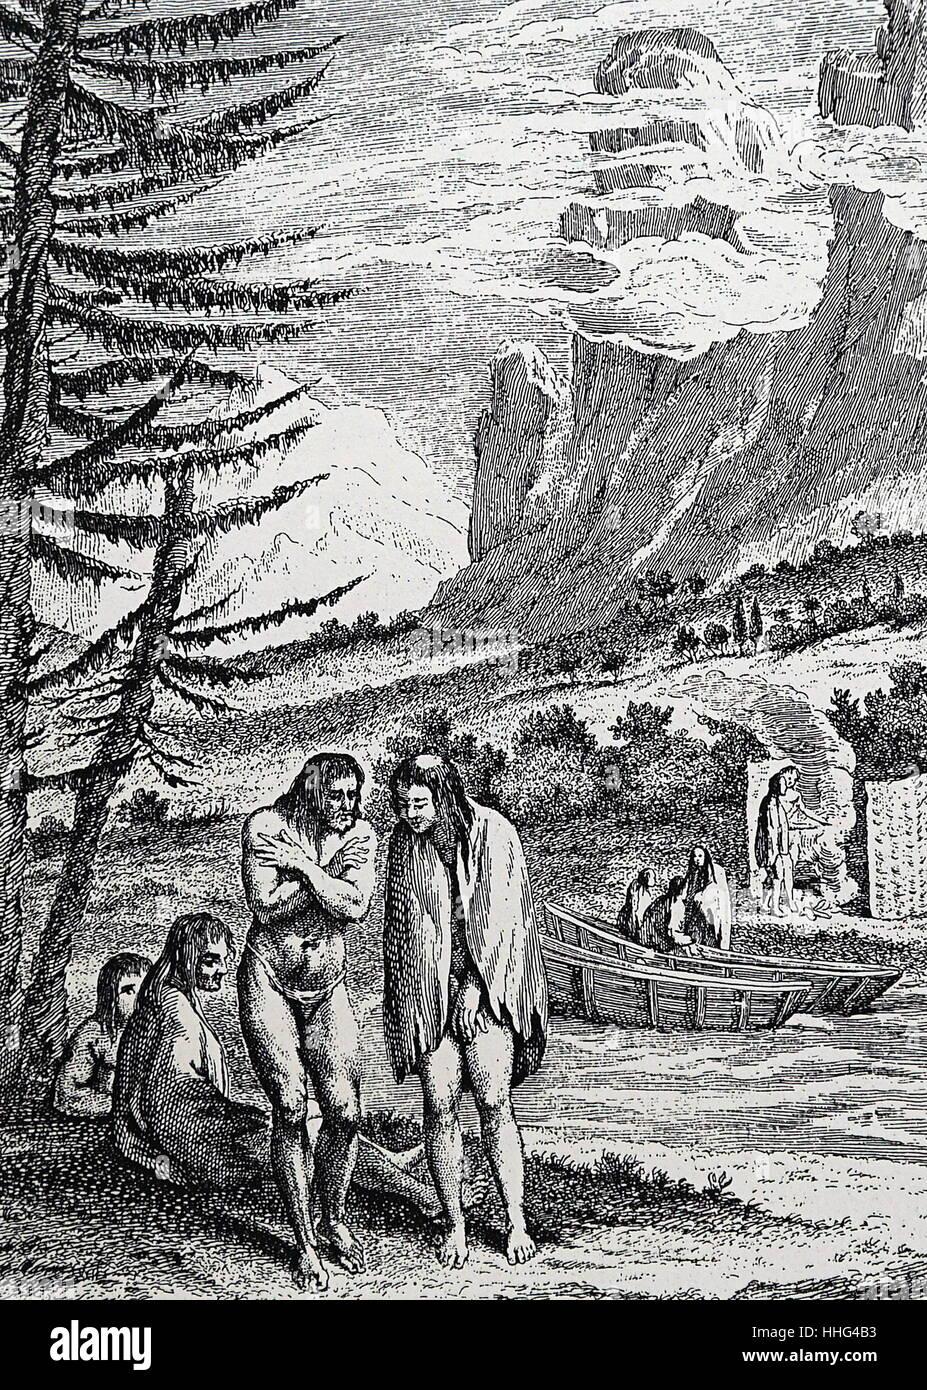 Natives of Patagonia encountered by Ferdinand Magellan - Stock Image